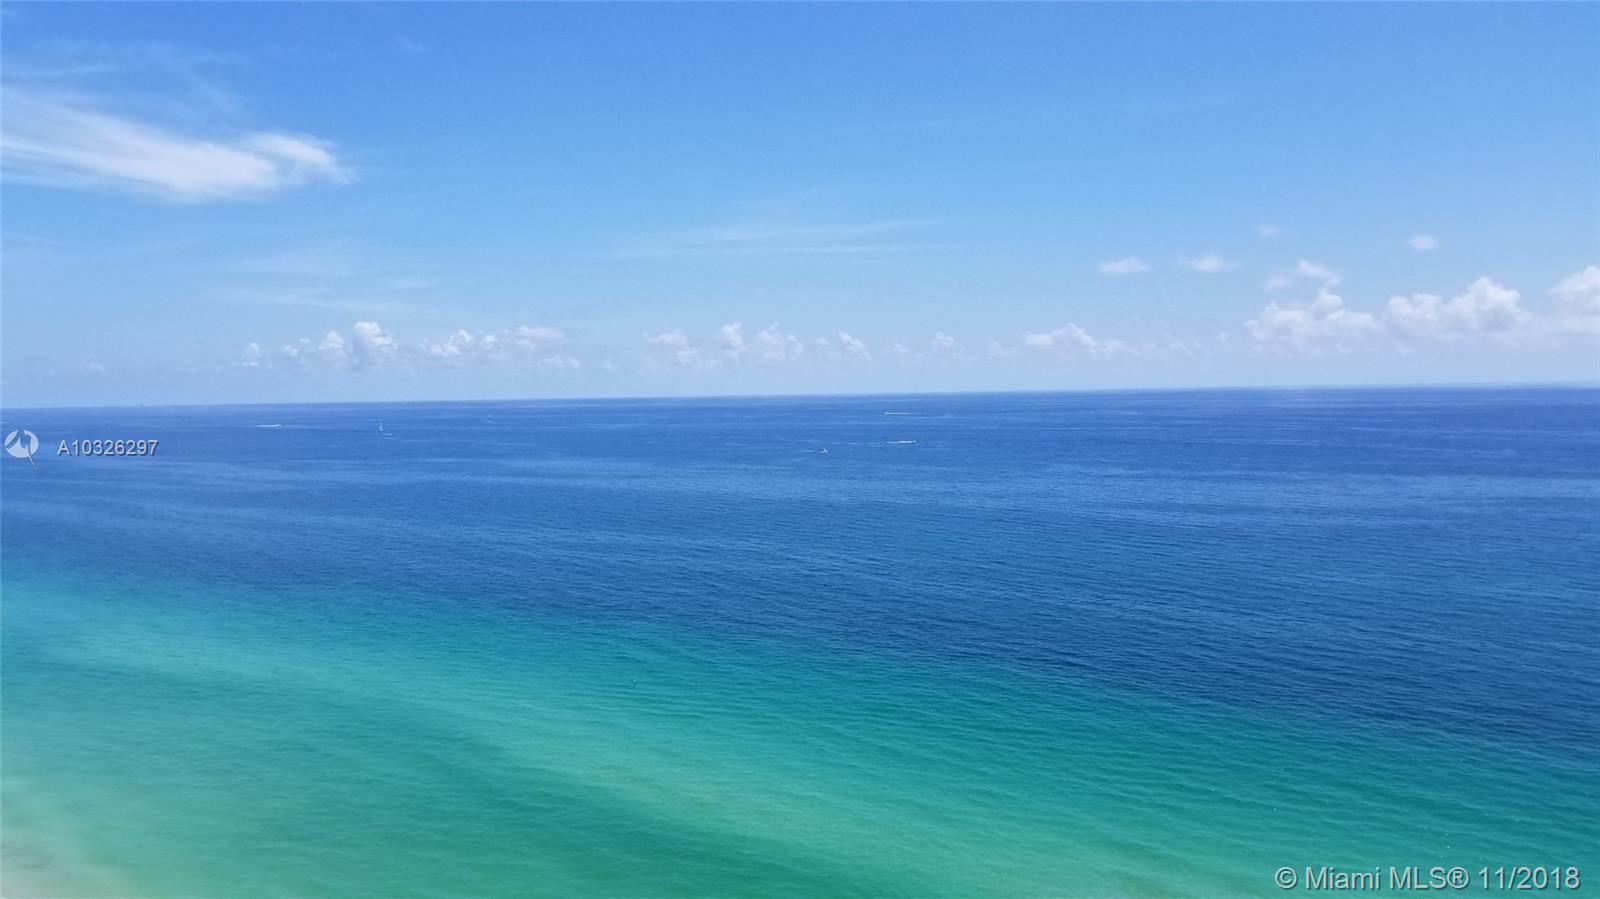 Porsche Design Tower #2305 - 18555 Collins Ave #2305, Sunny Isles Beach, FL 33160